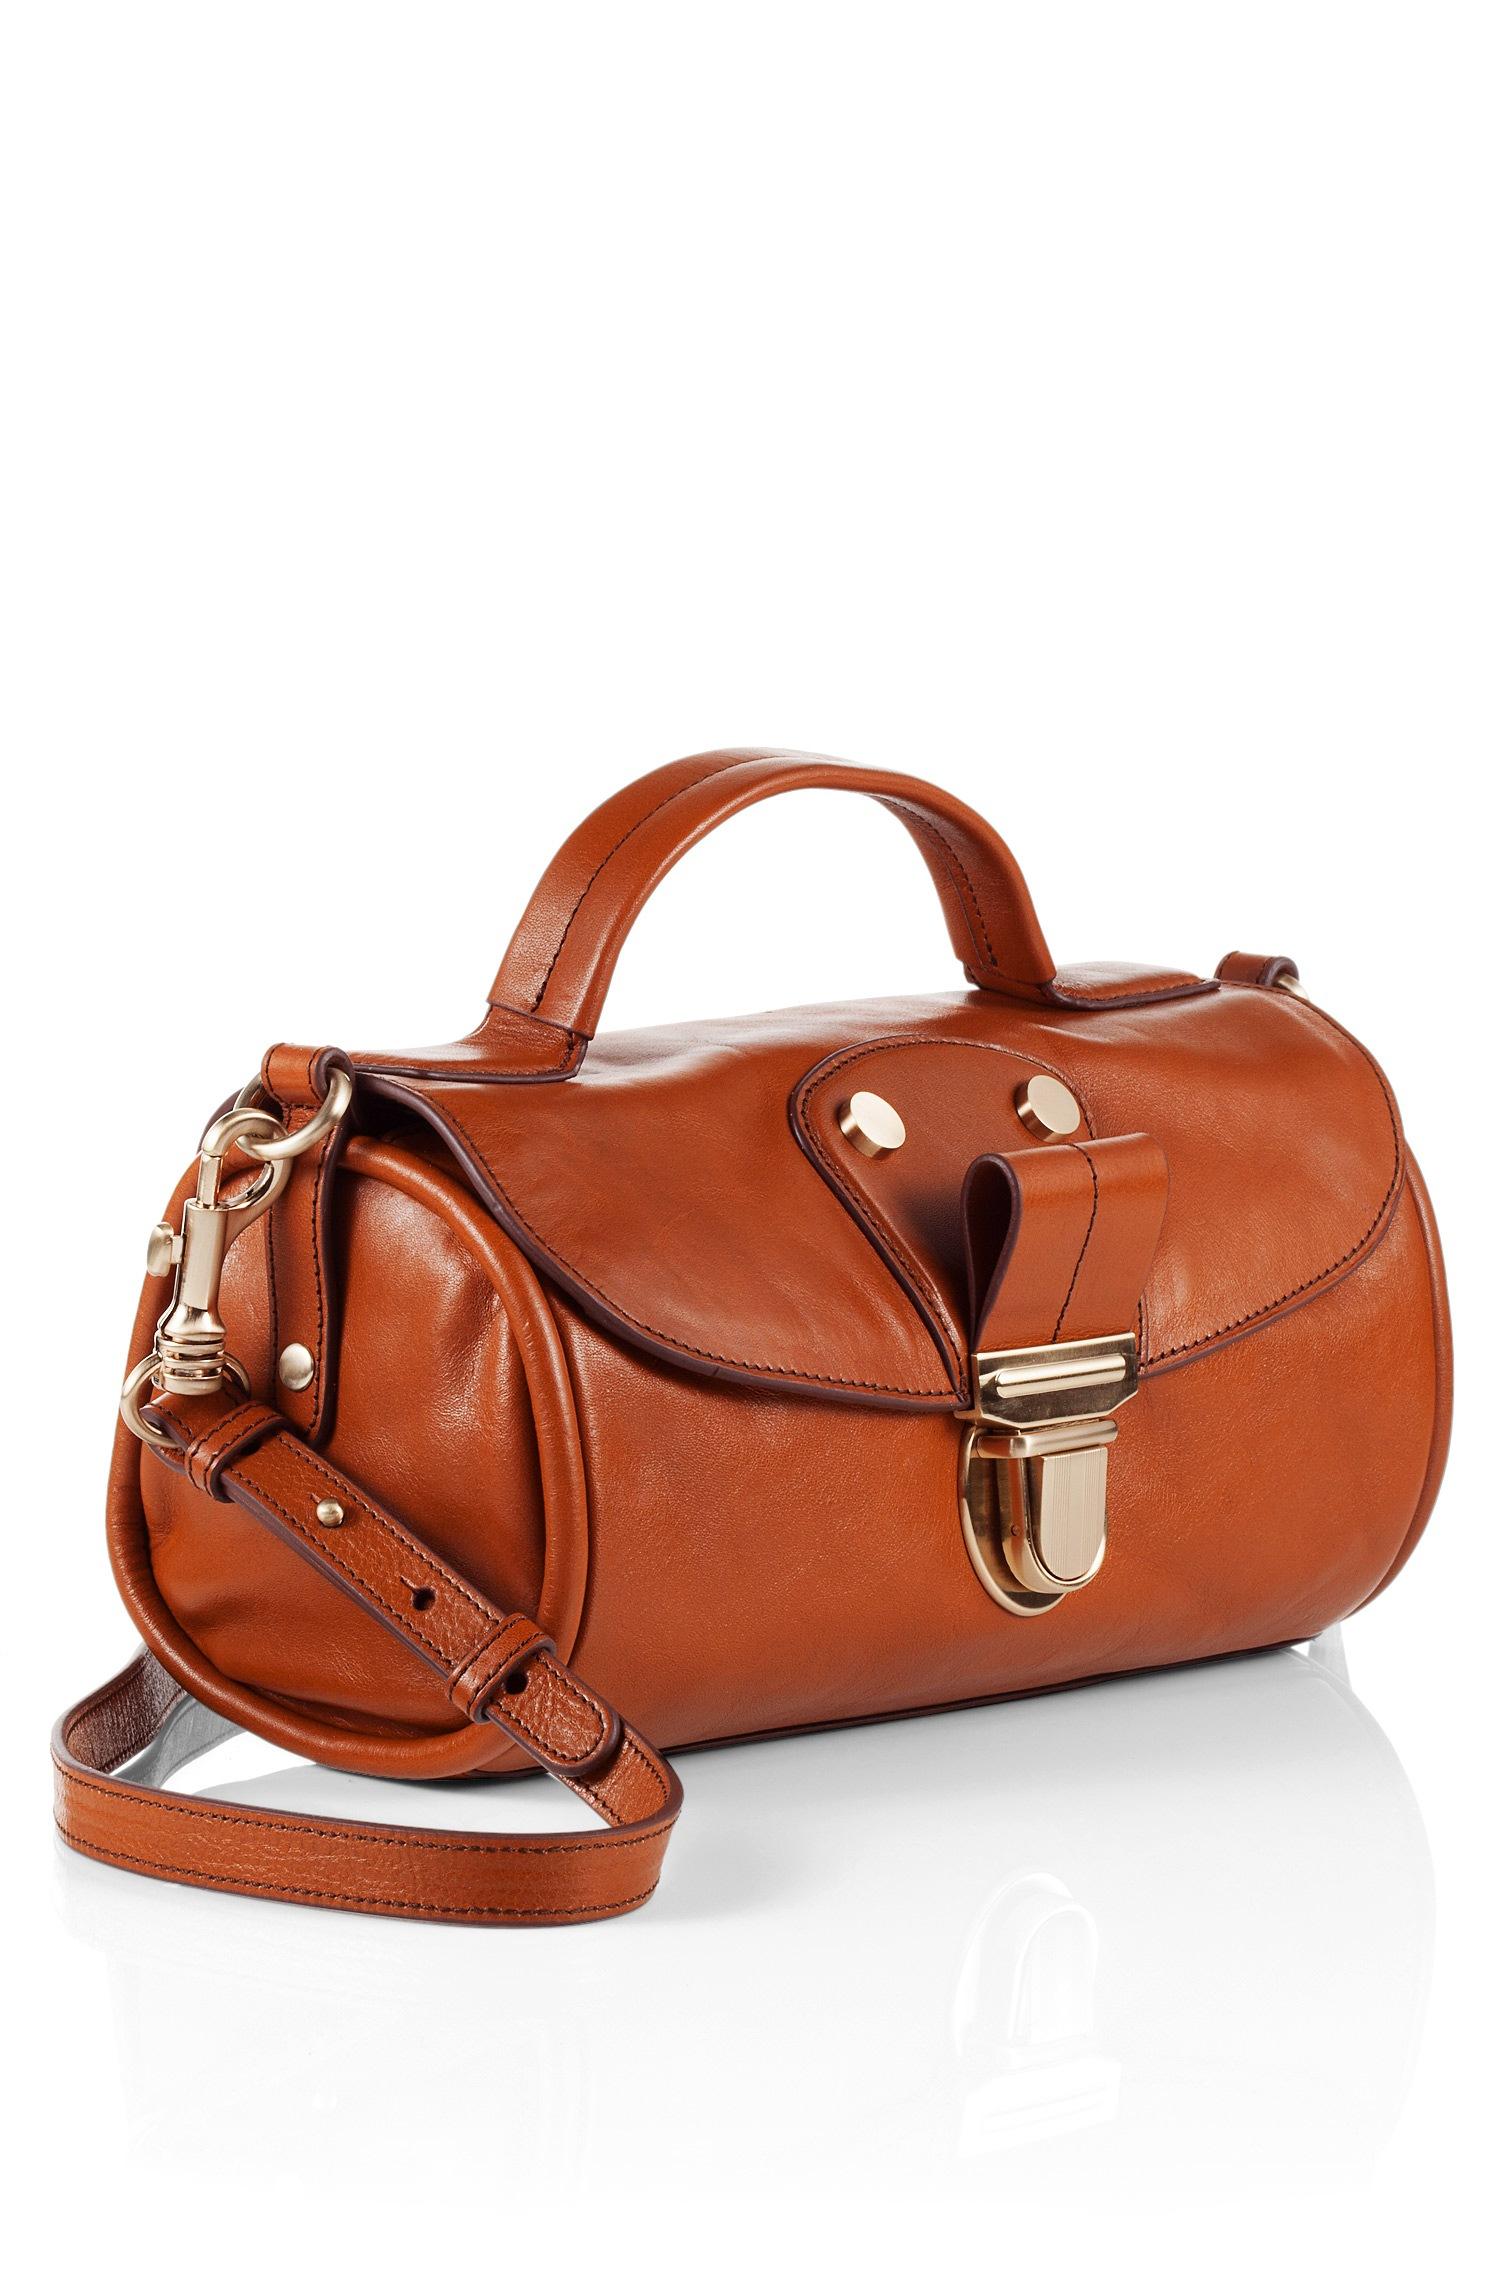 6aa532f1838 BOSS Orange Leather Crossbody Bag 'Soraya' in Brown - Lyst